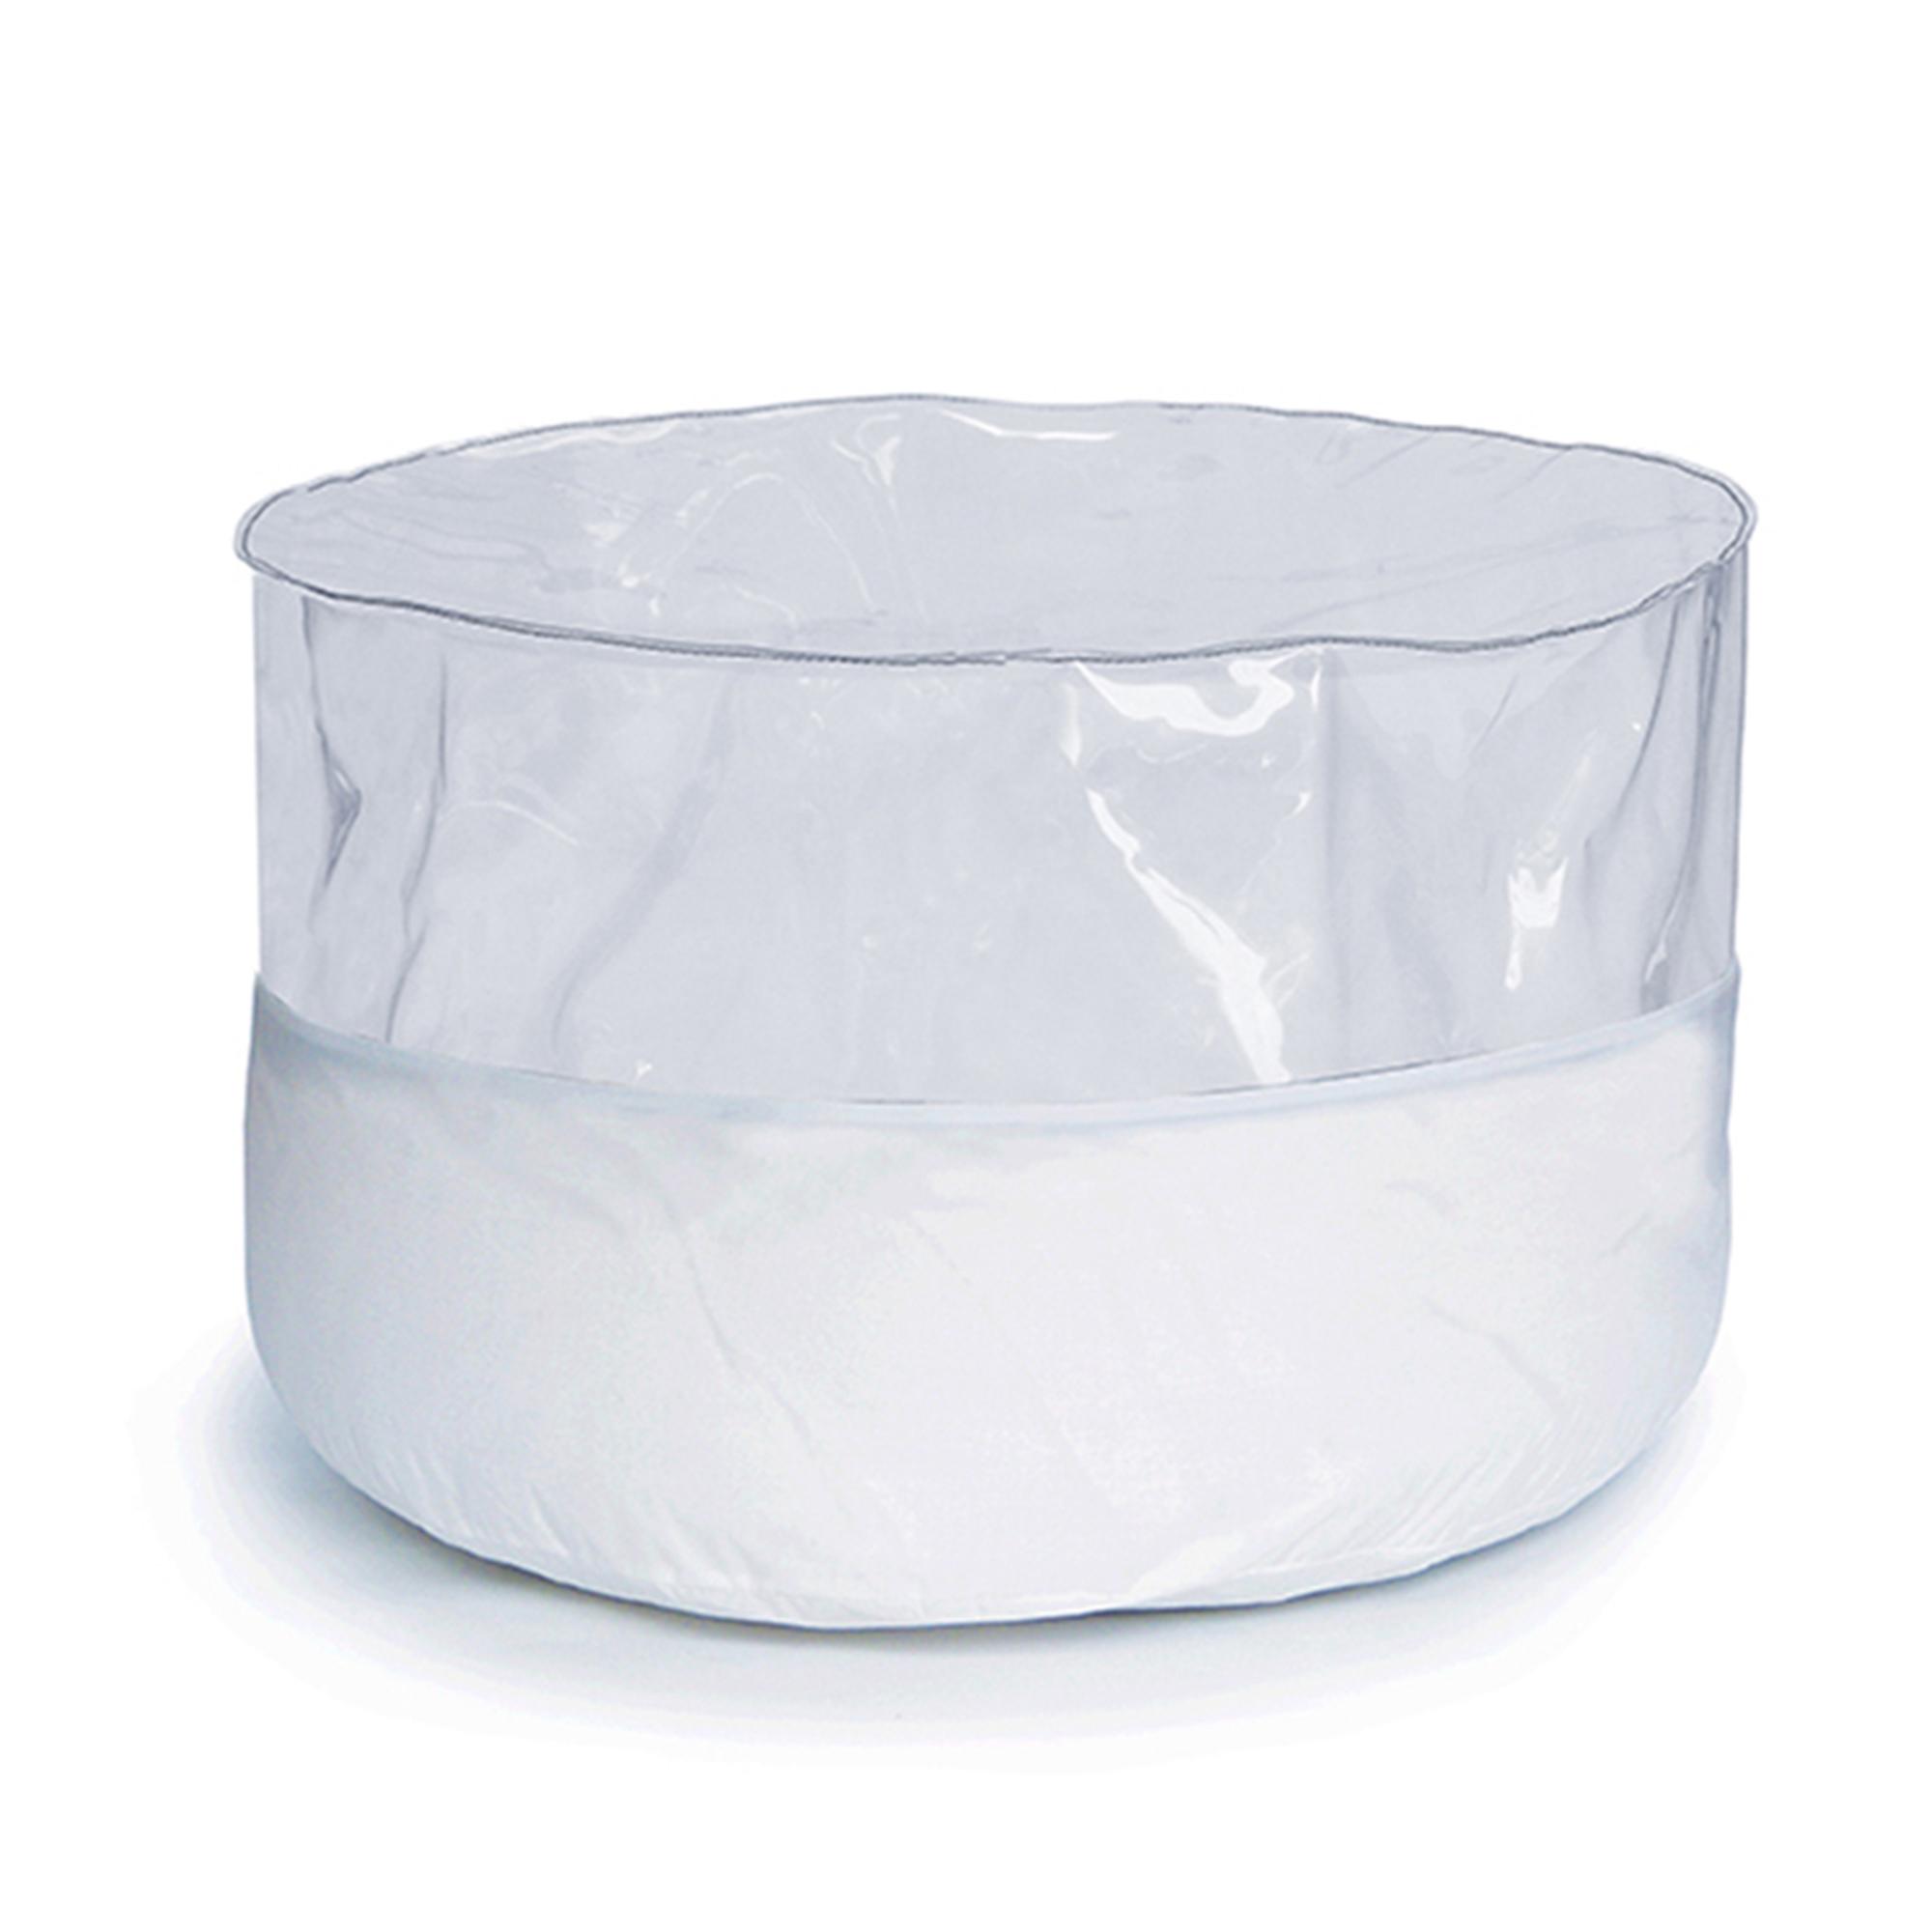 Pouf bicolore blanc à remplir